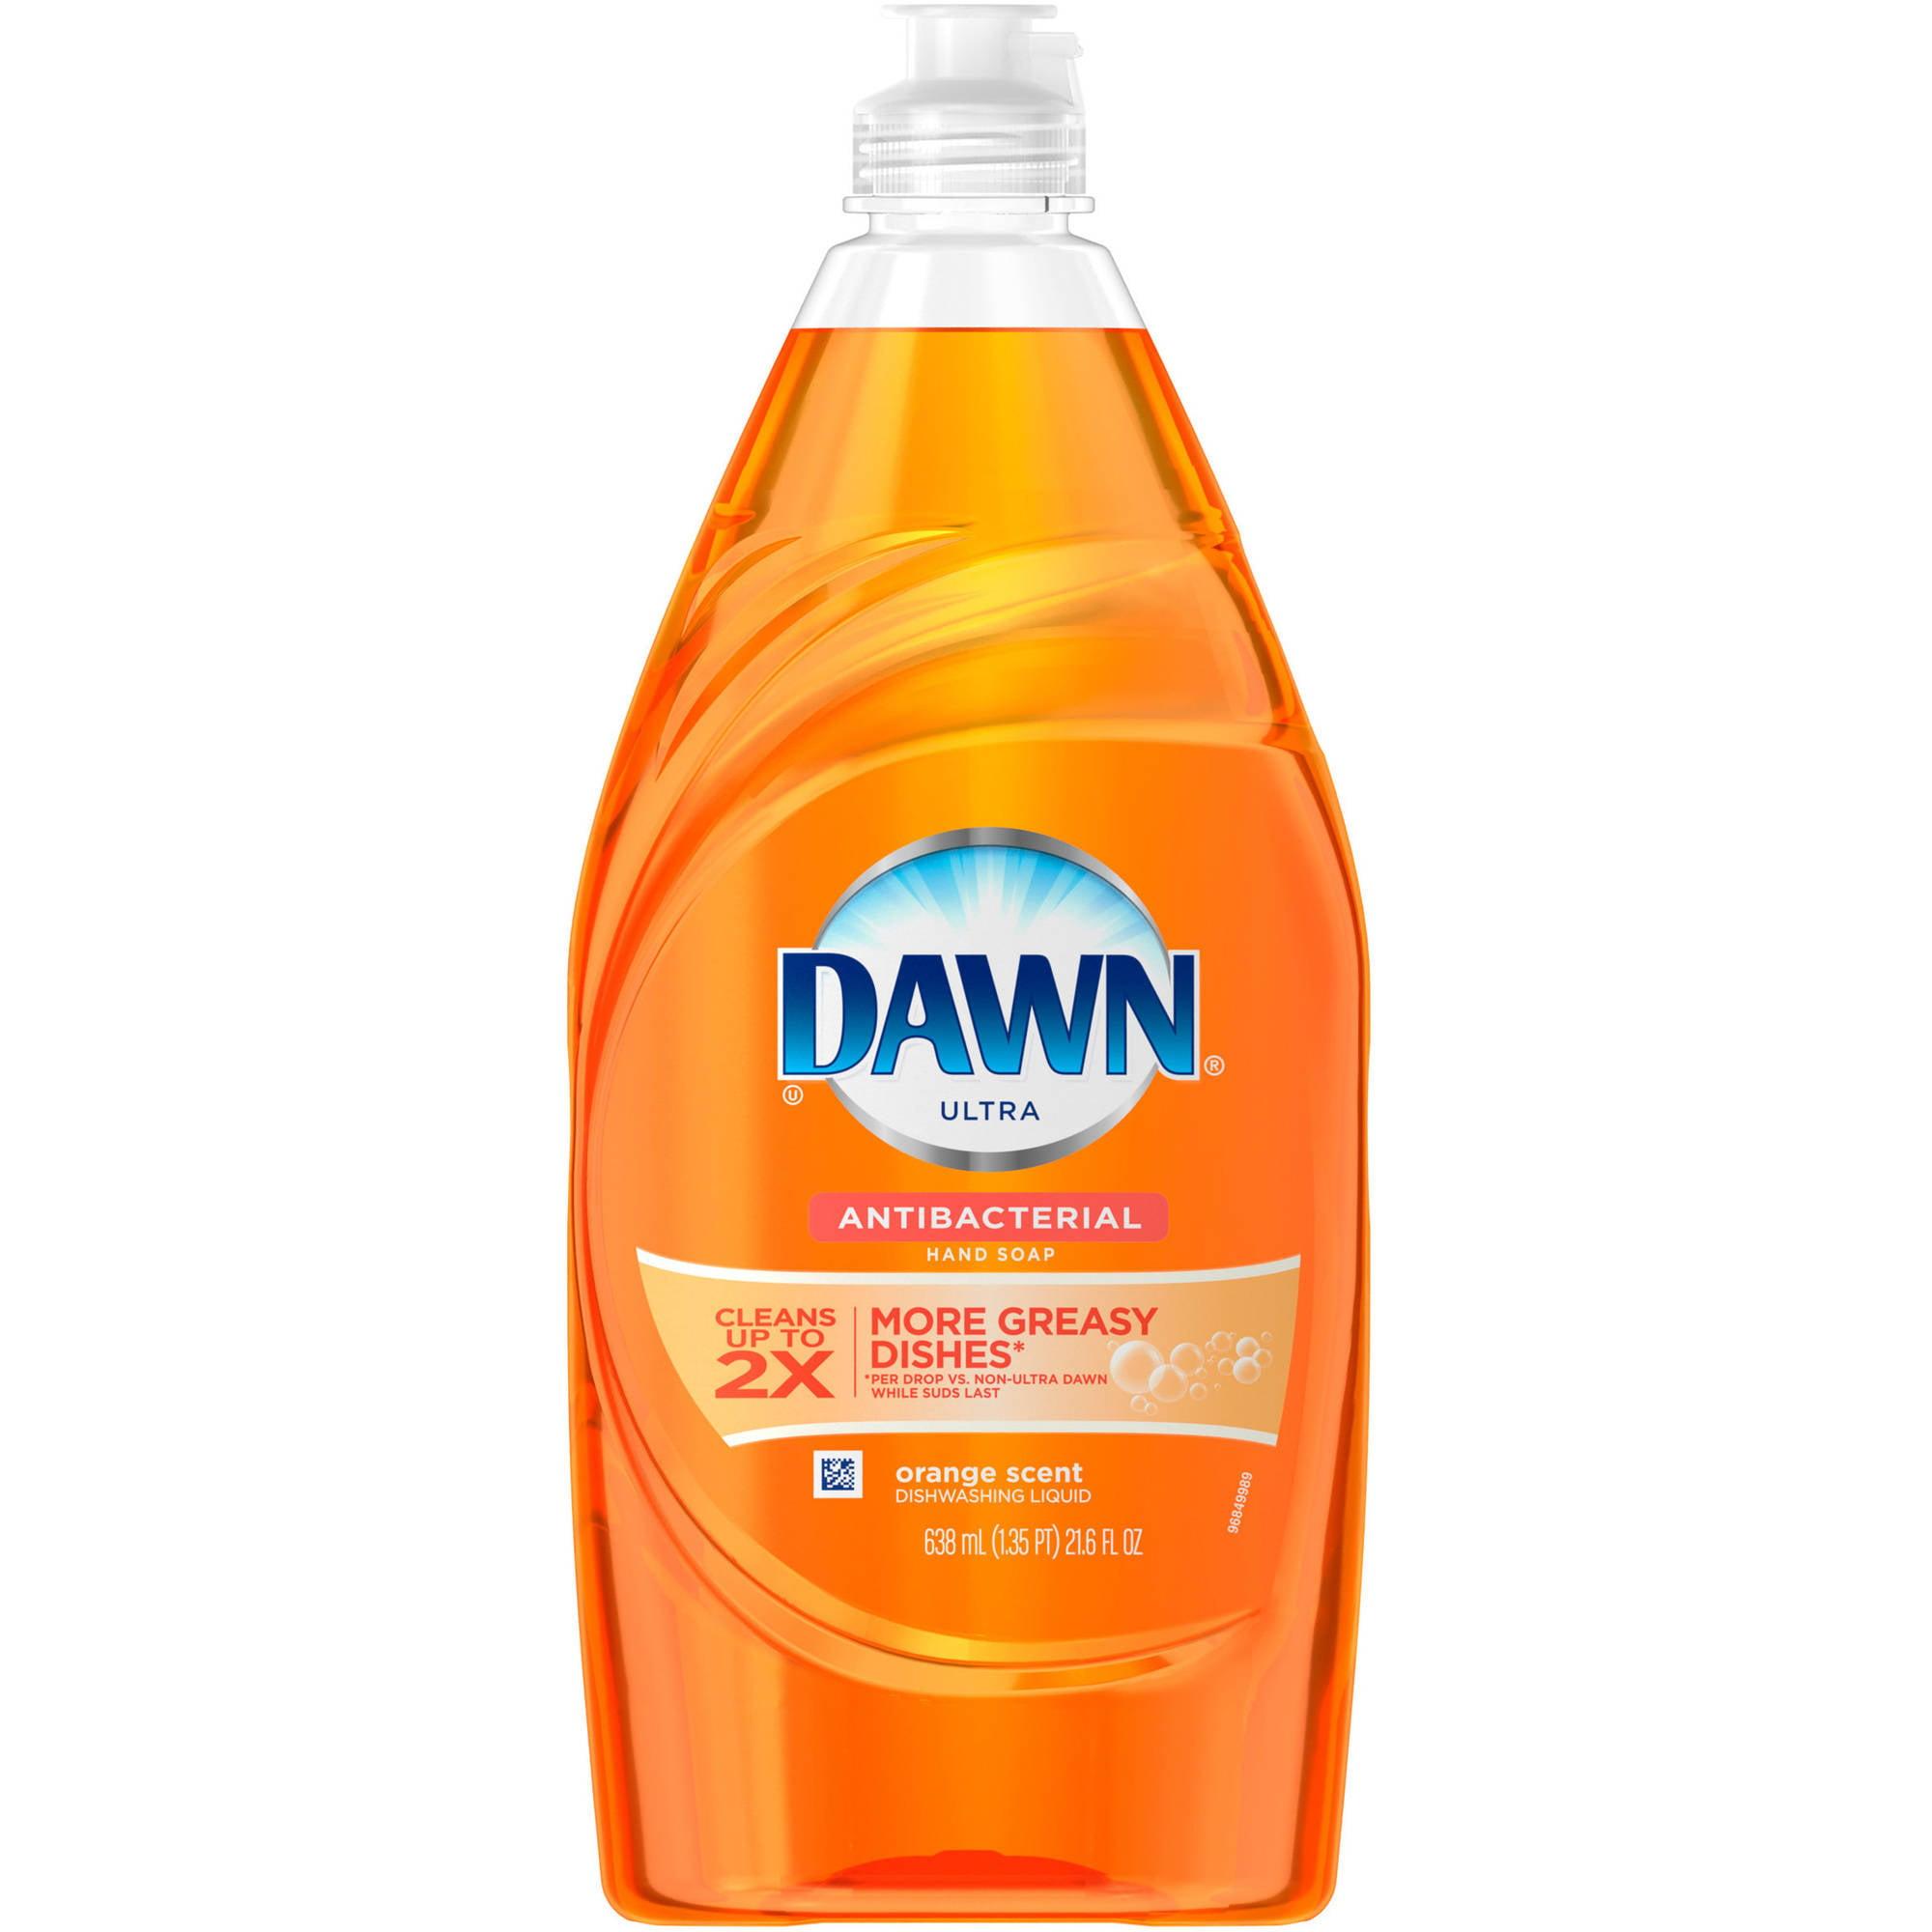 Dawn Ultra Antibacterial Hand Soap Orange Scent Dishwashing Liquid 21.6 Fl Oz